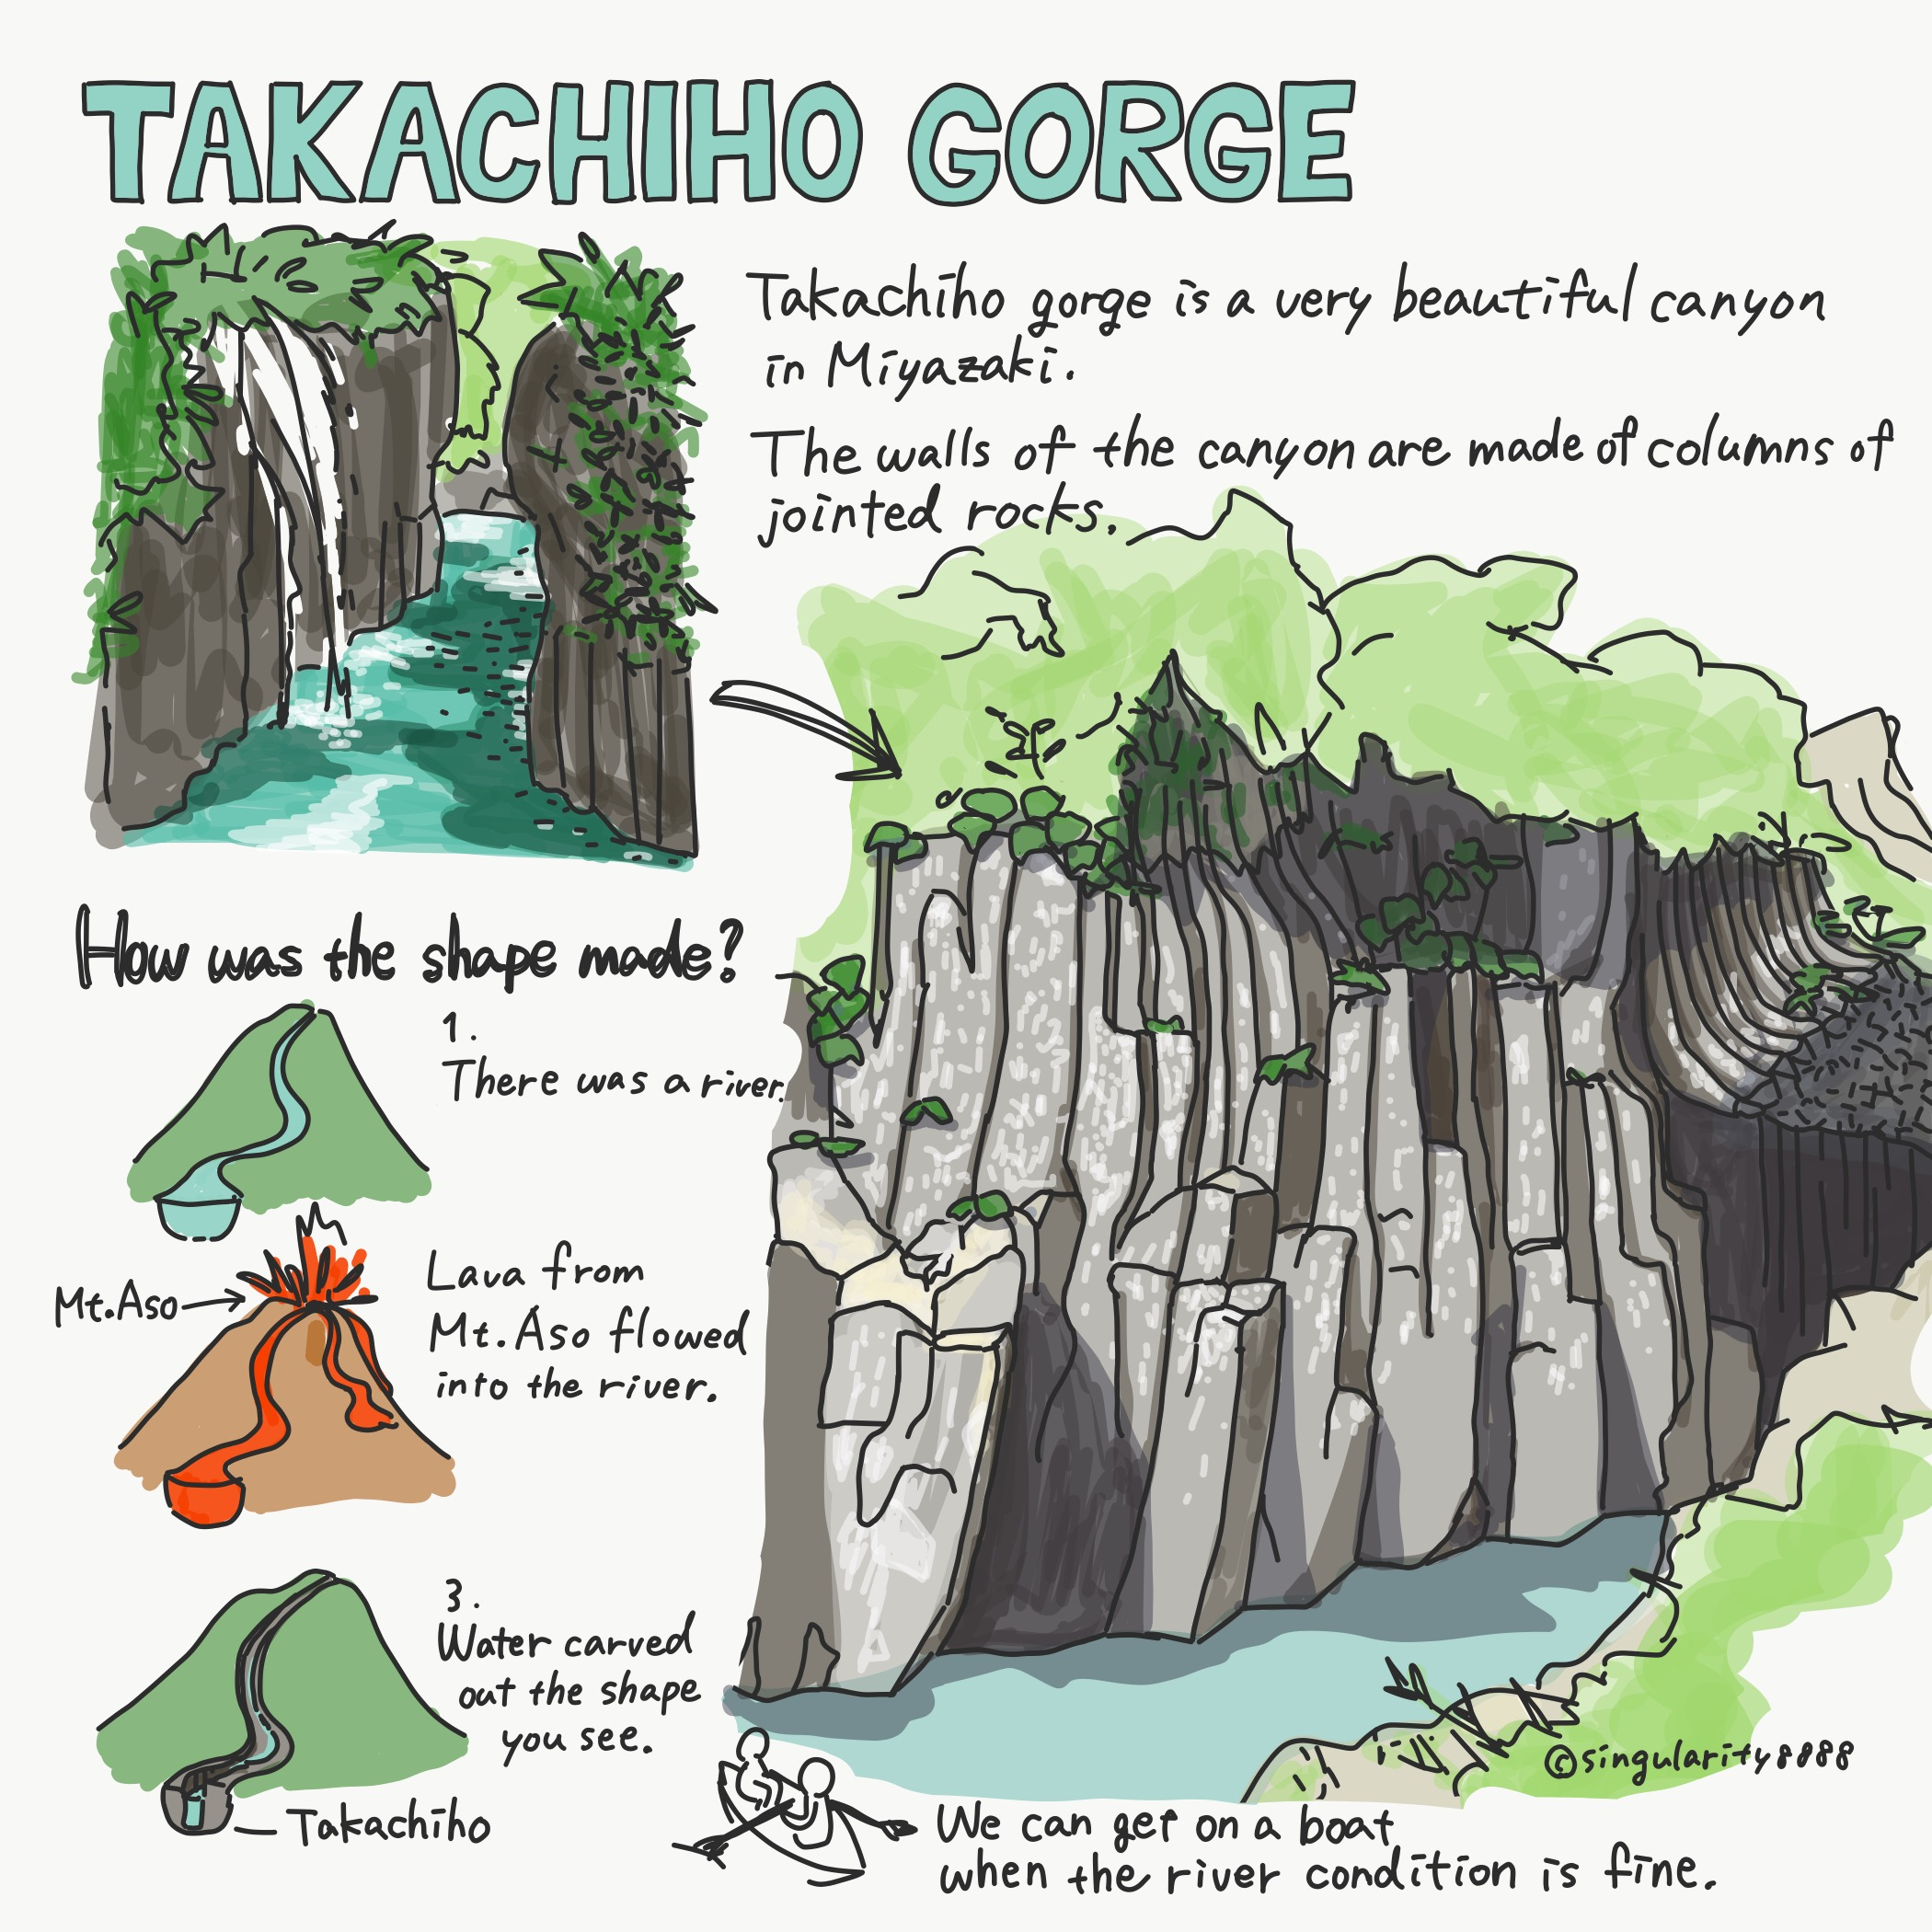 TAKACHIHO GORGE Image